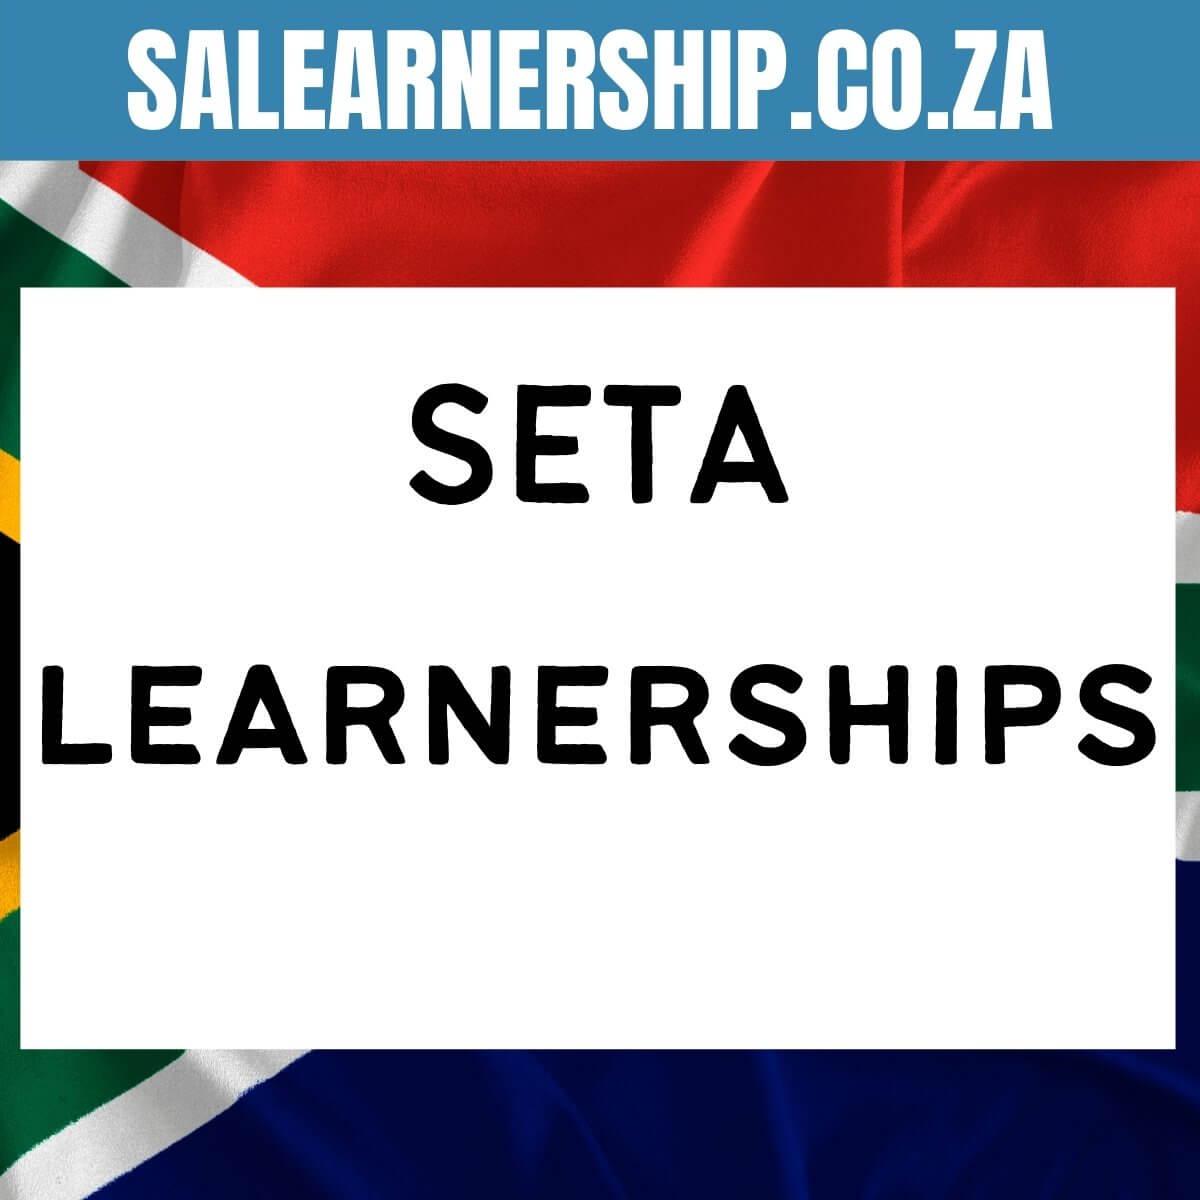 Seta Learnerships 2021 2022